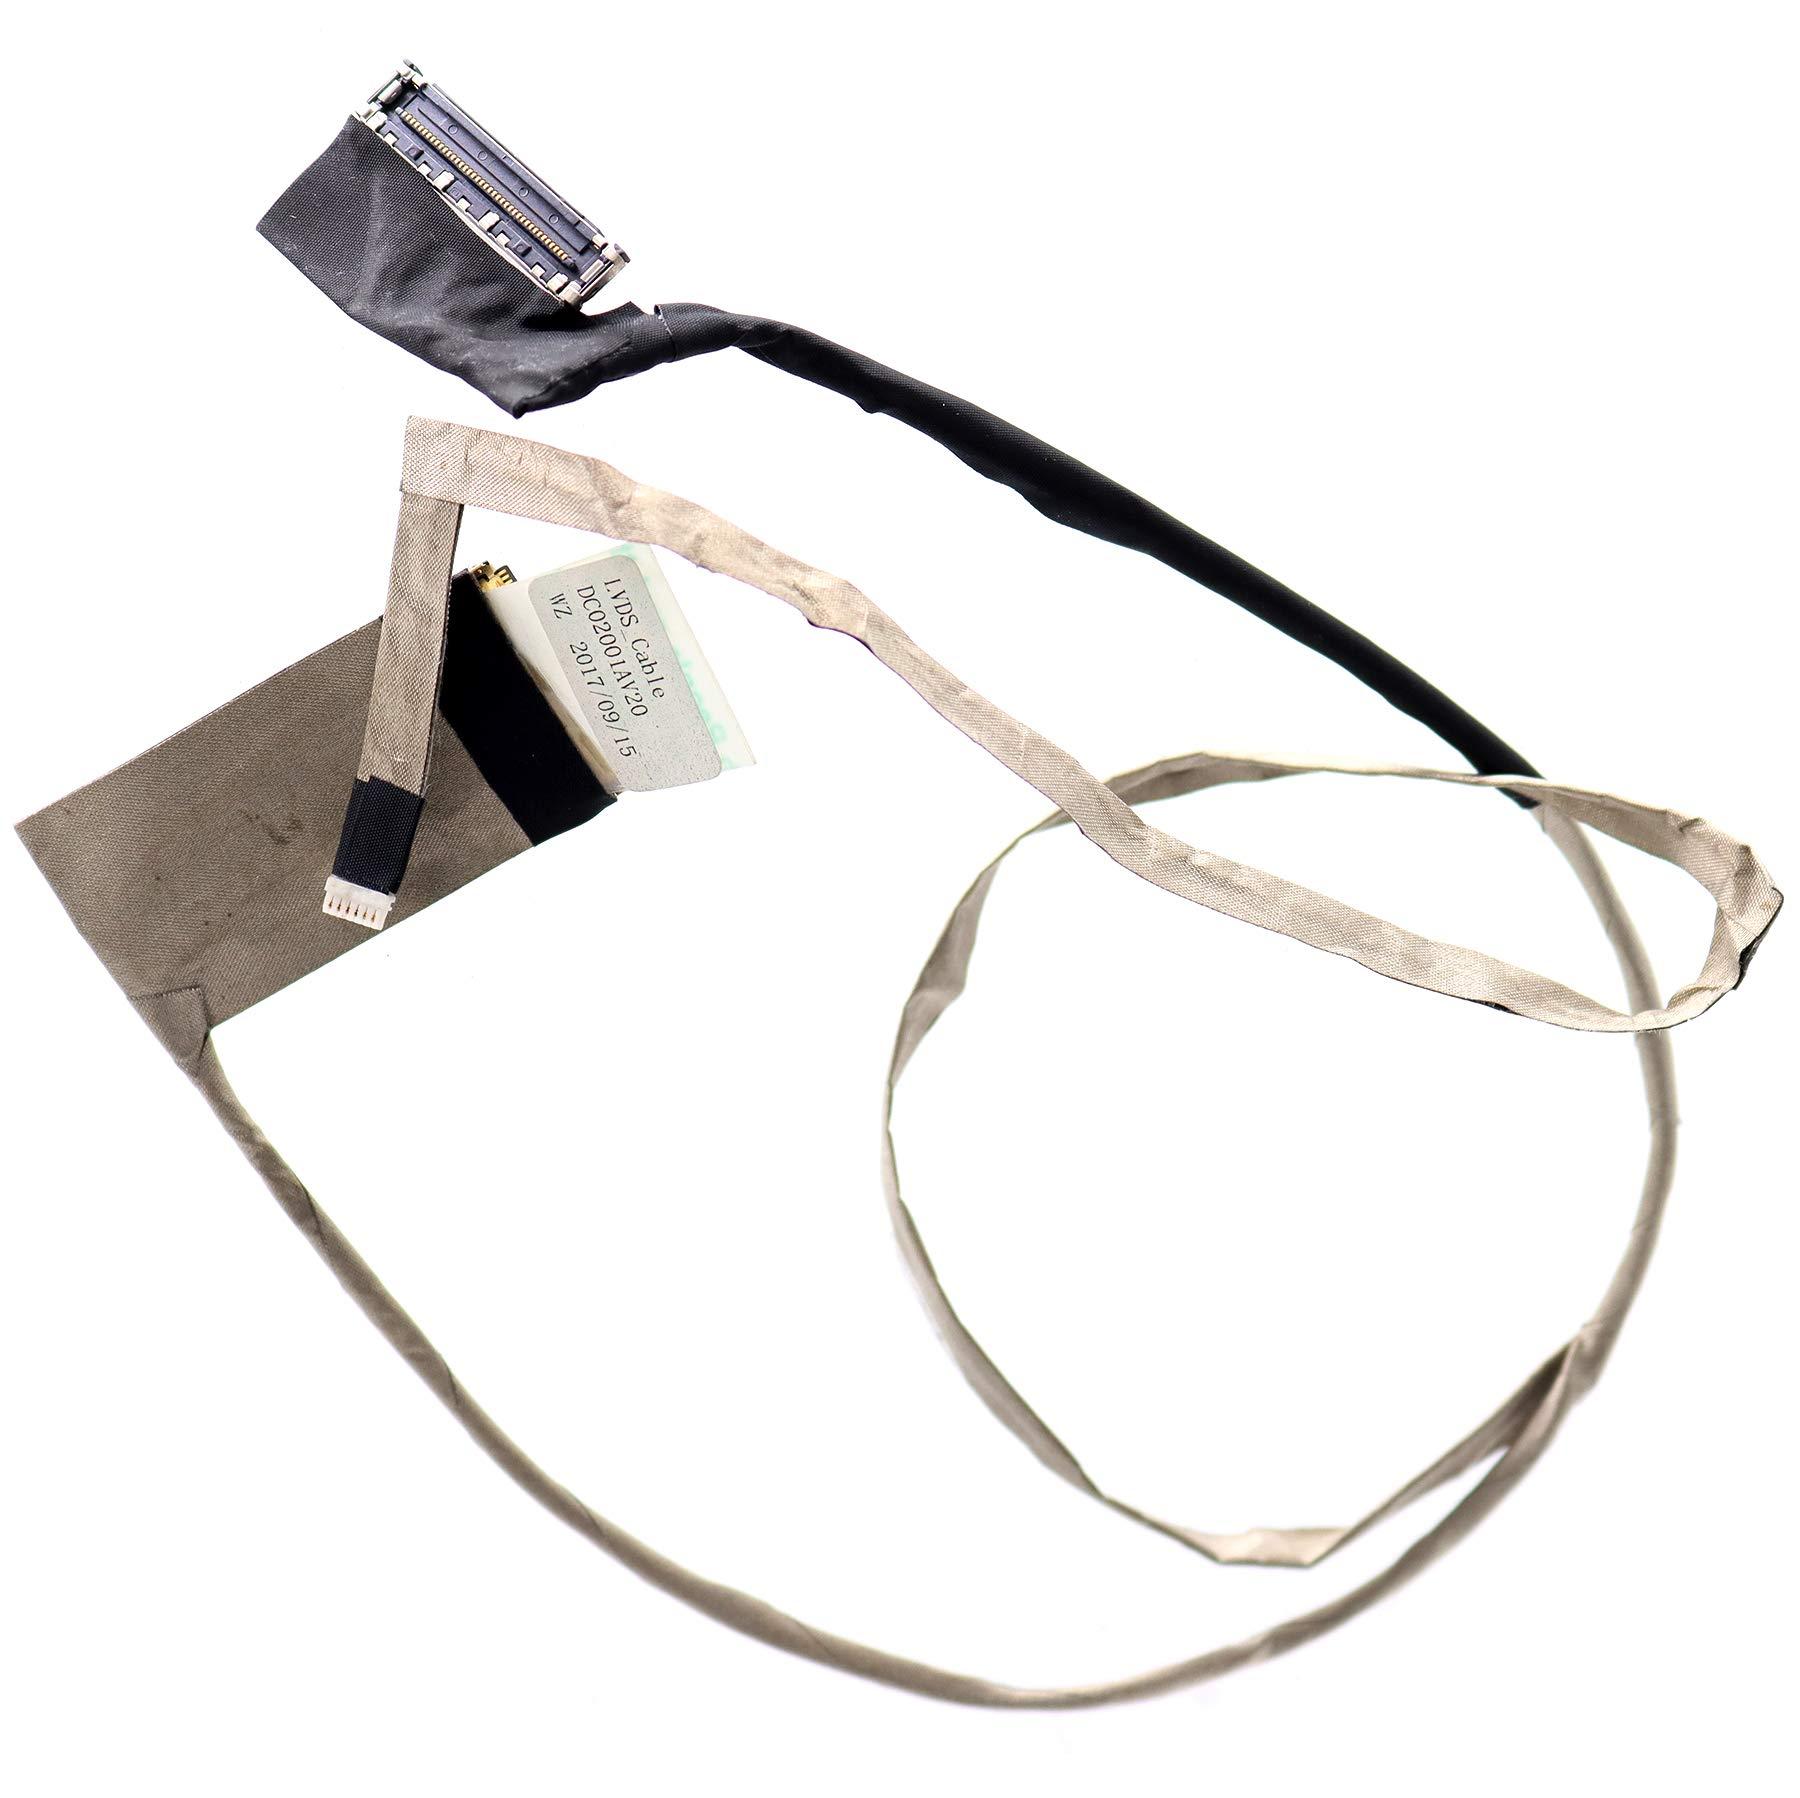 Cable Flex LVDS para ASUS K53 A53 X53 A53S A53U A53Z A53T K5